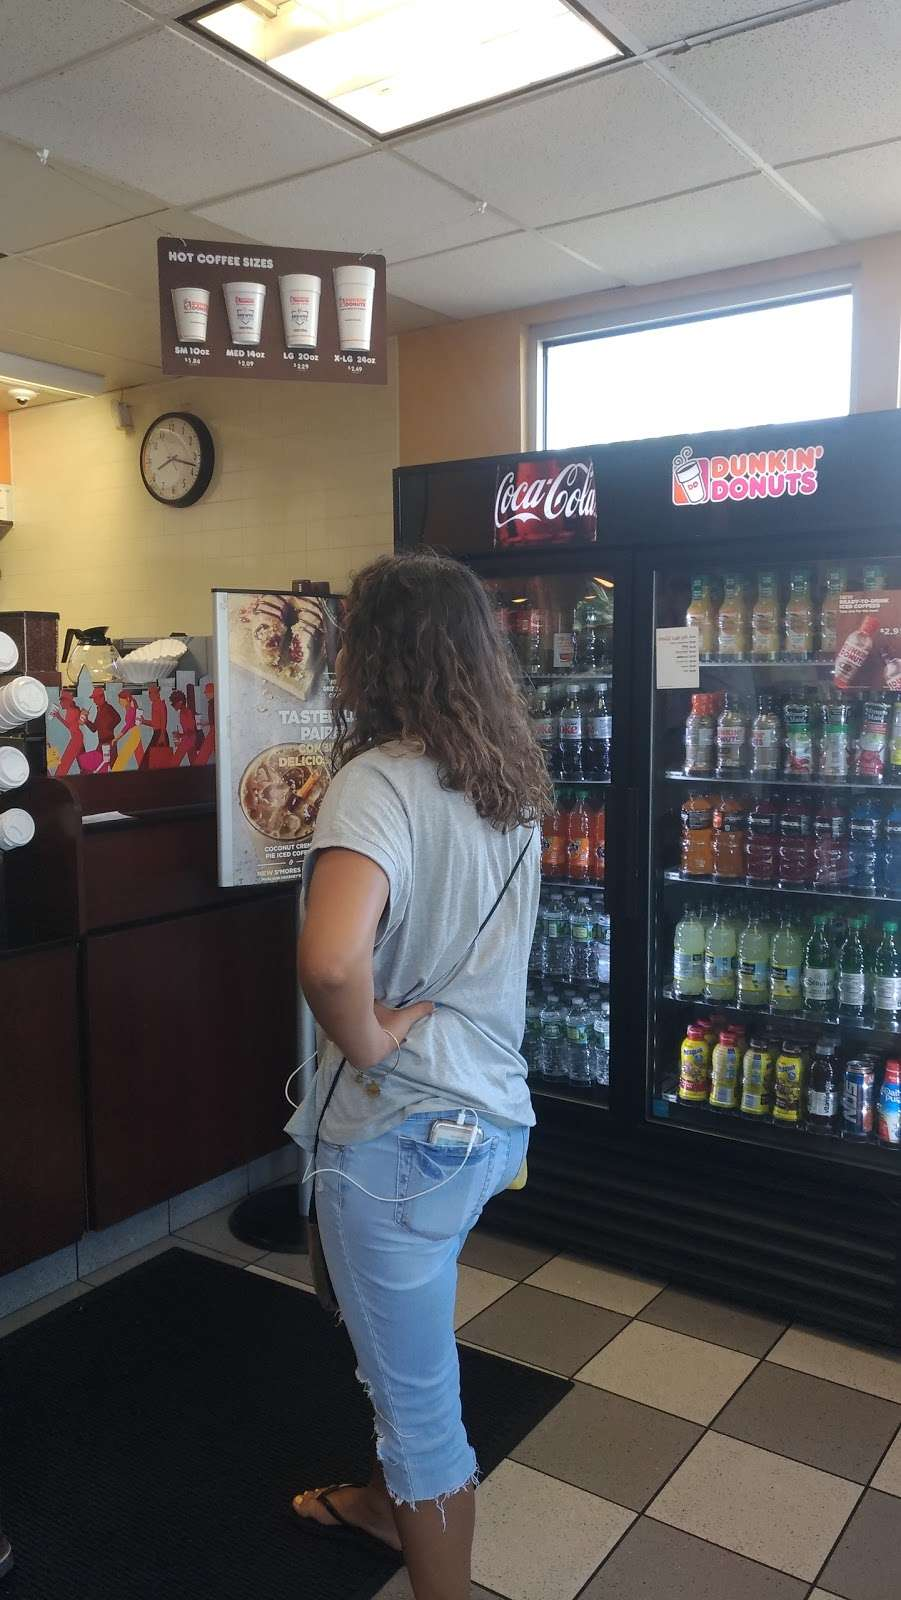 Dunkin Donuts - cafe  | Photo 10 of 10 | Address: 402 Grand St #436, Jersey City, NJ 07302, USA | Phone: (201) 309-0777